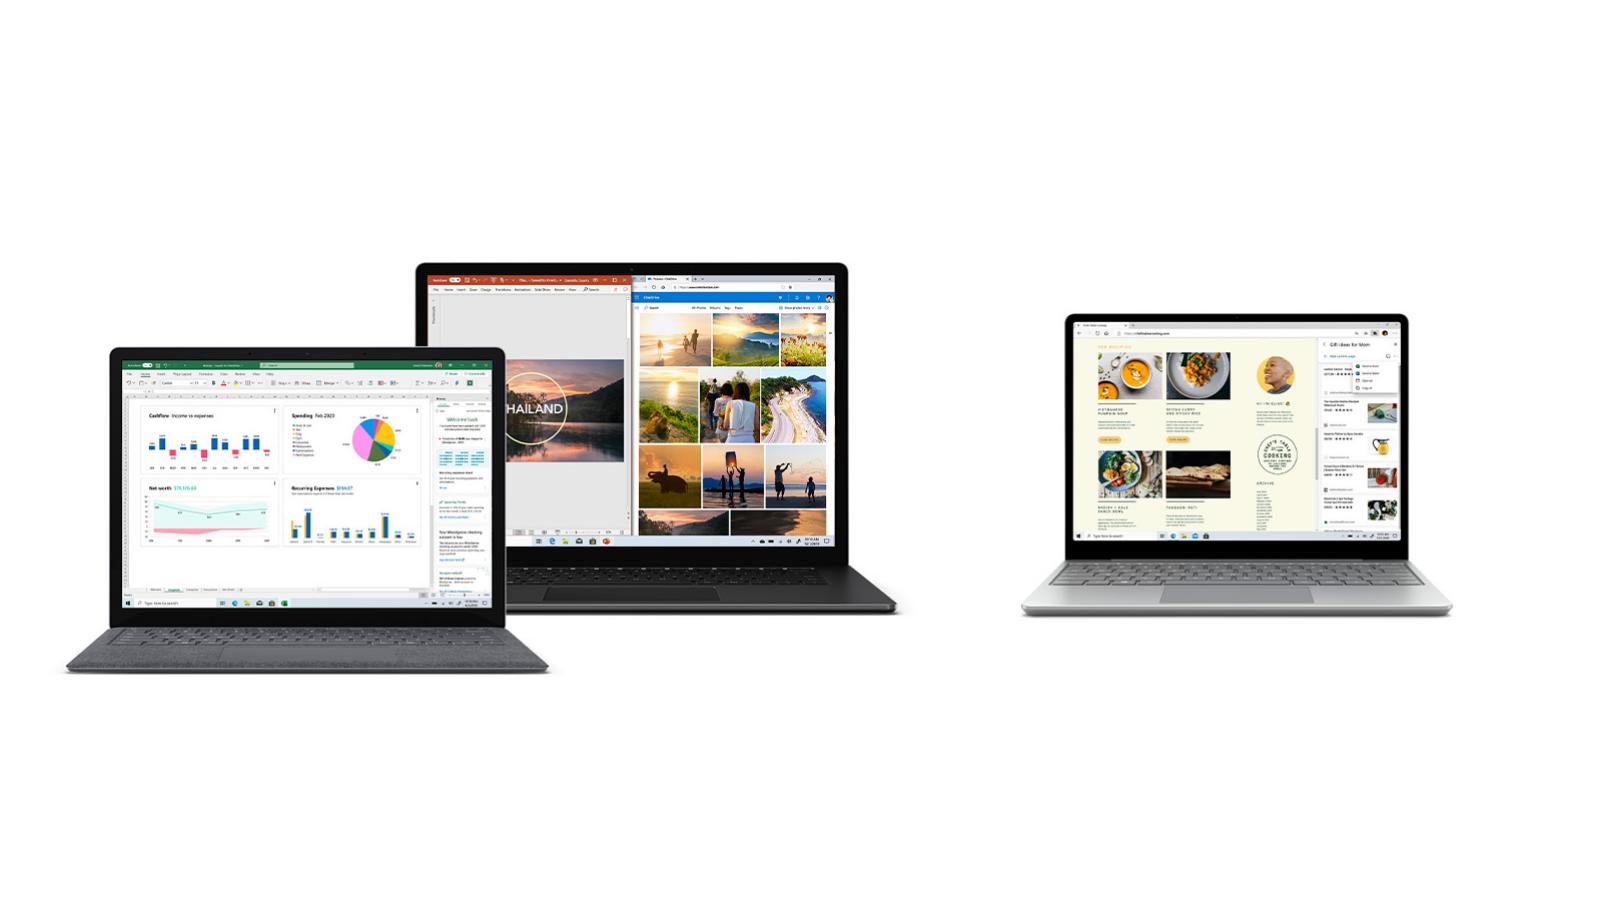 surface laptops